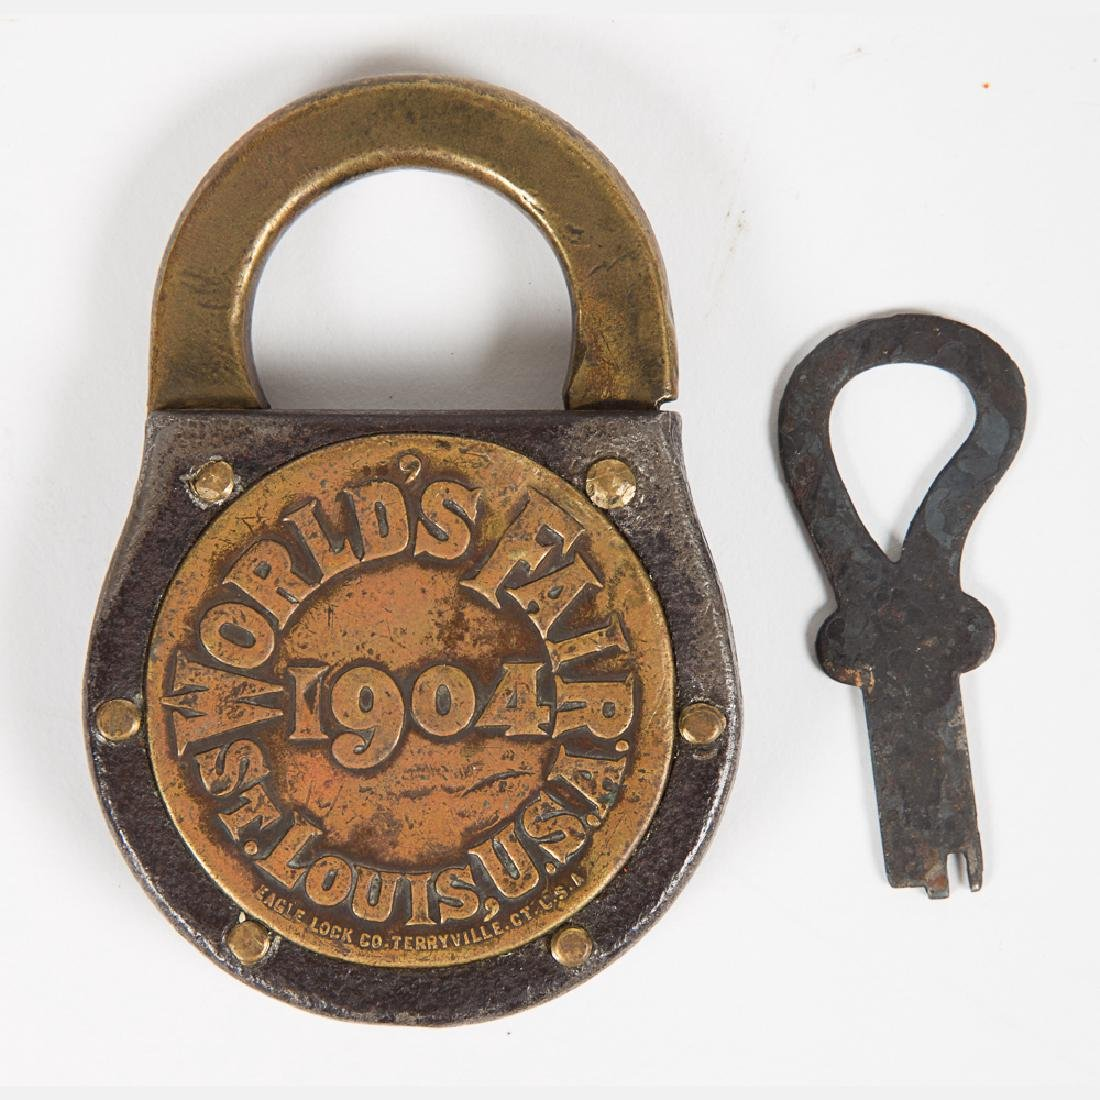 An Iron and Brass Eagle Lock & Co. World's Fair 1904 - 2